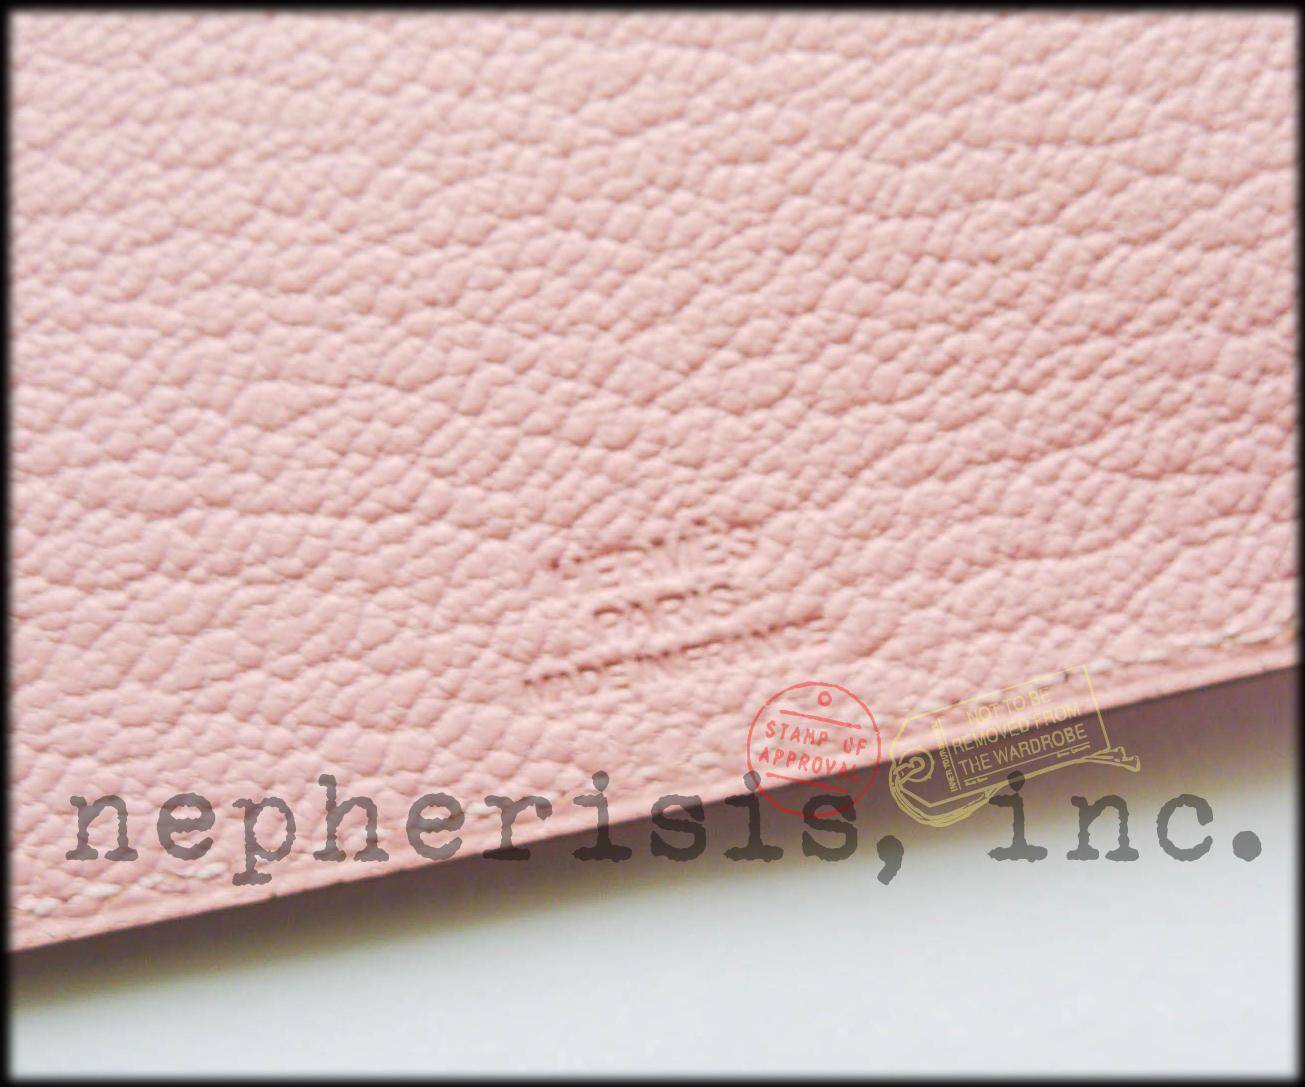 AUTH BNIB Hermes TARMAC PM Passport Holder or Cover in Pink Chevre ROSE SAKURA image 6